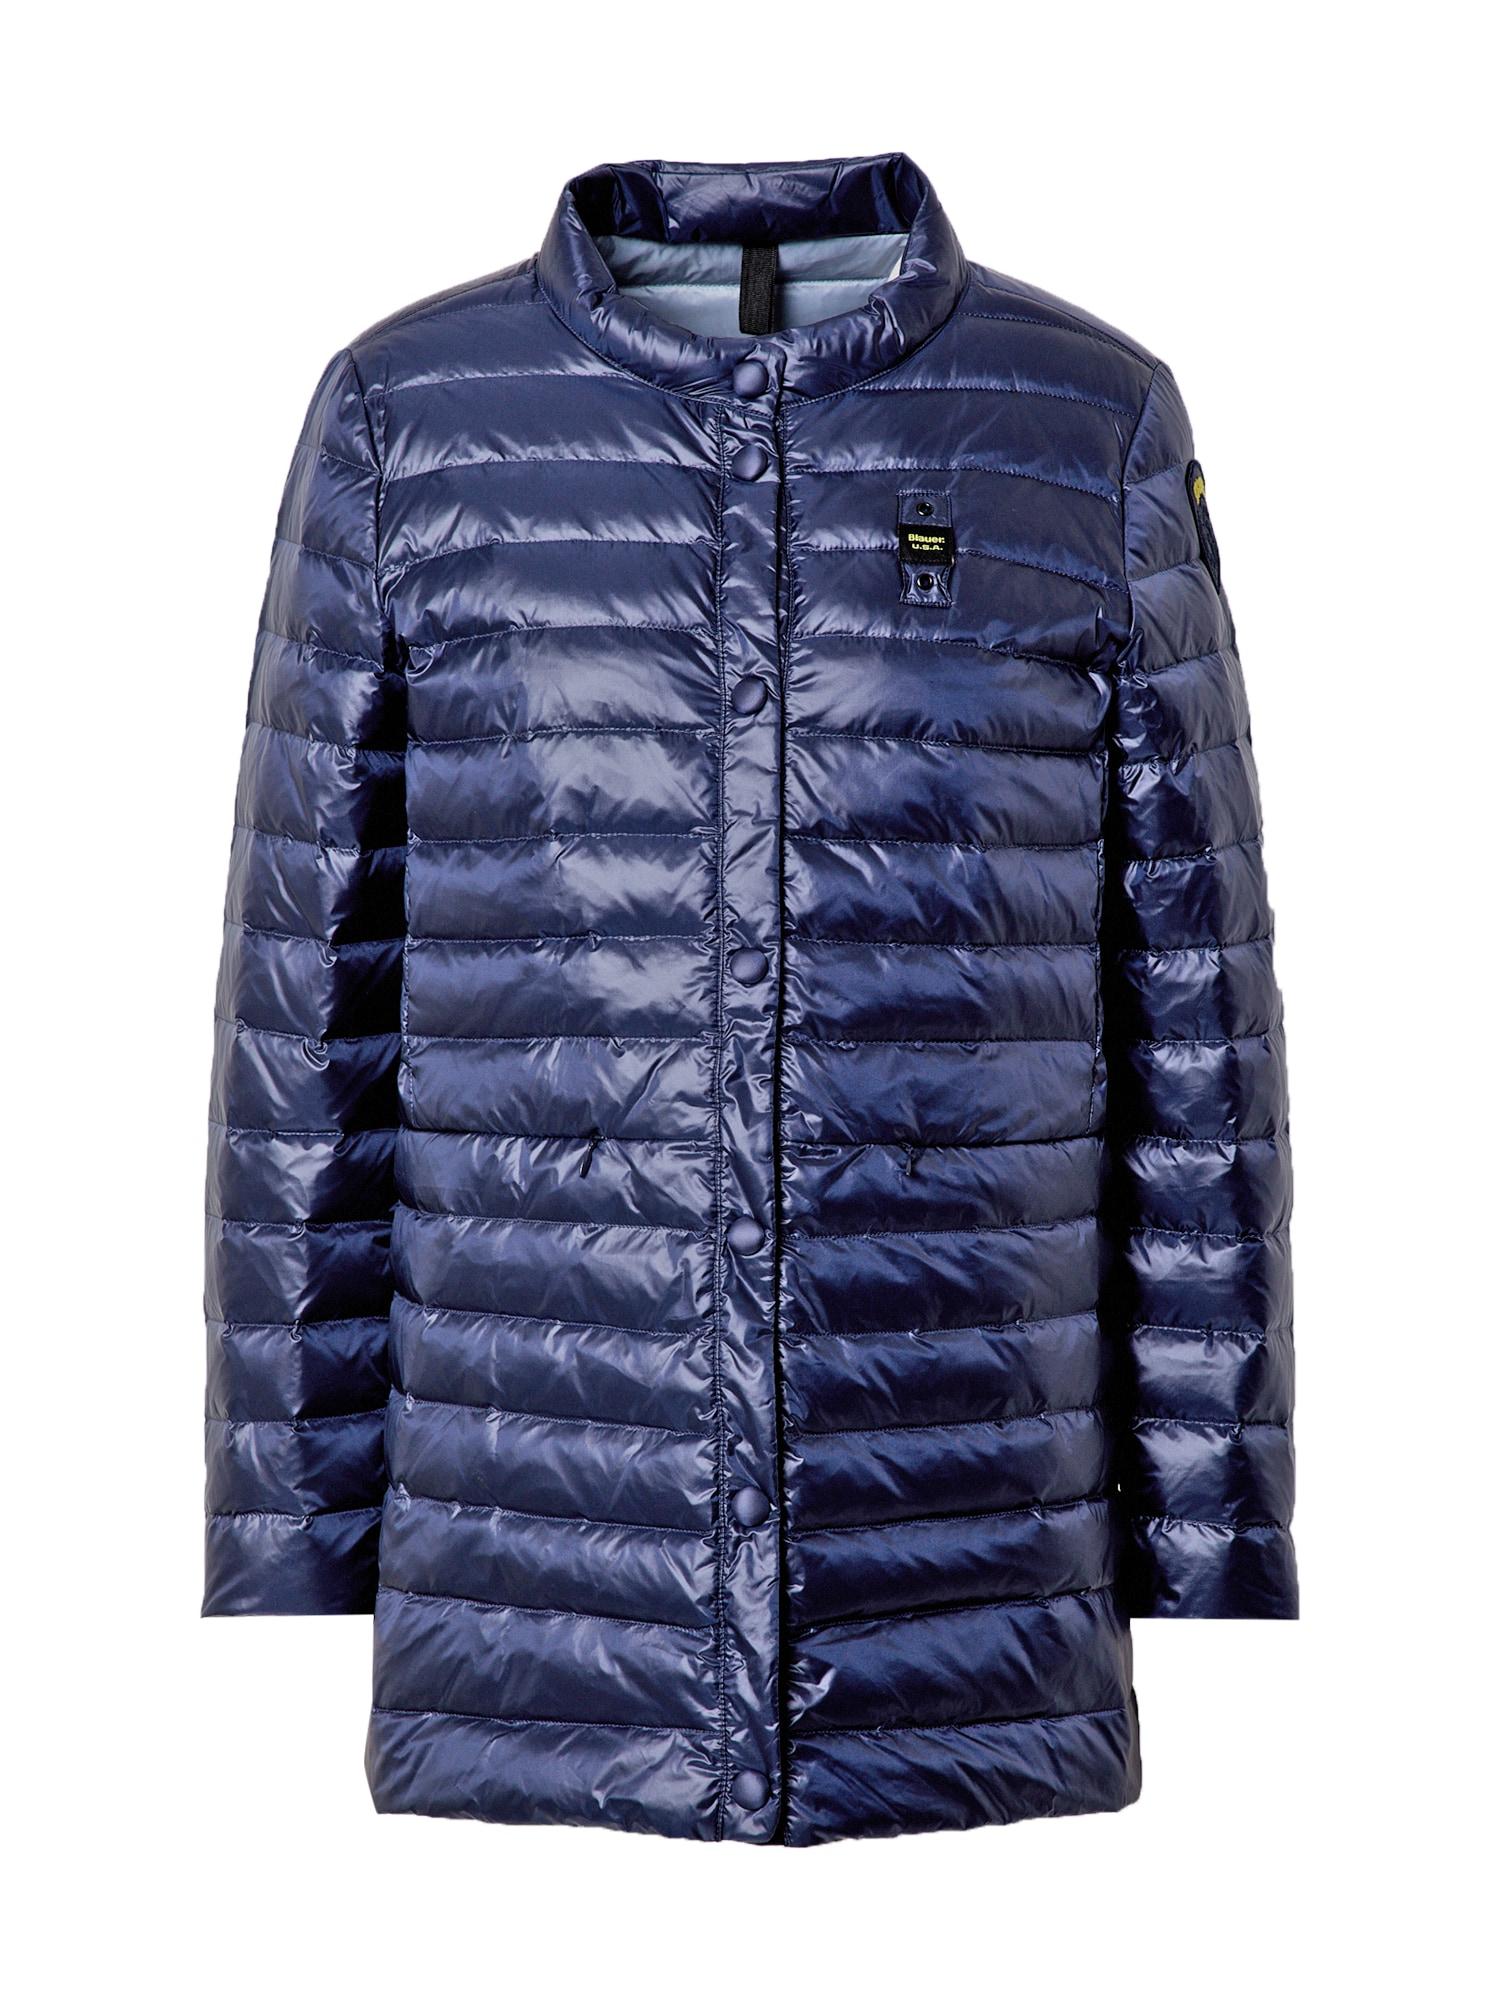 Blauer.USA Demisezoninis paltas tamsiai mėlyna